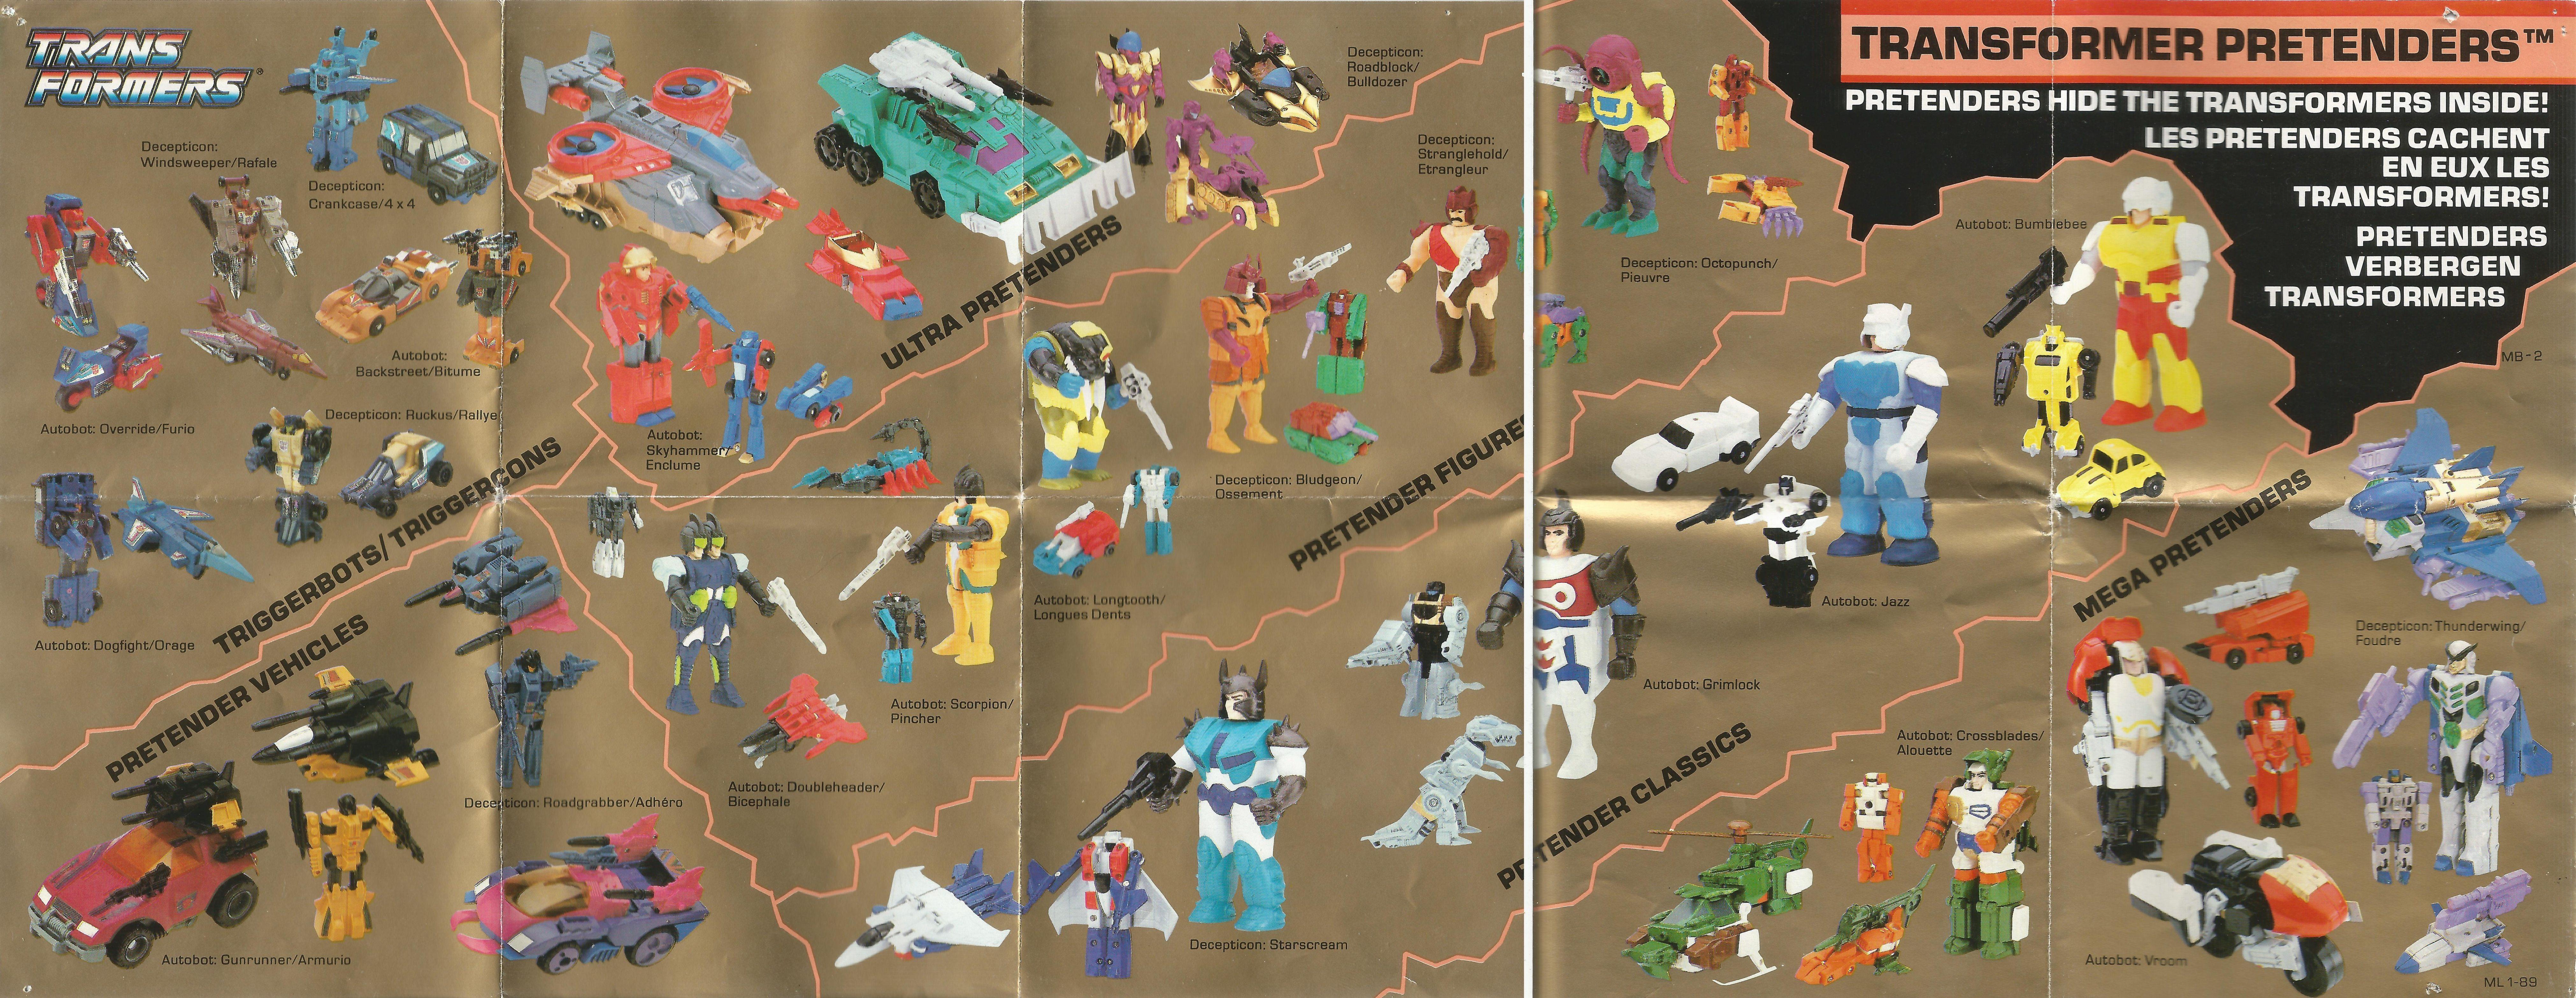 Európai Transformers katalógus 1989-ből